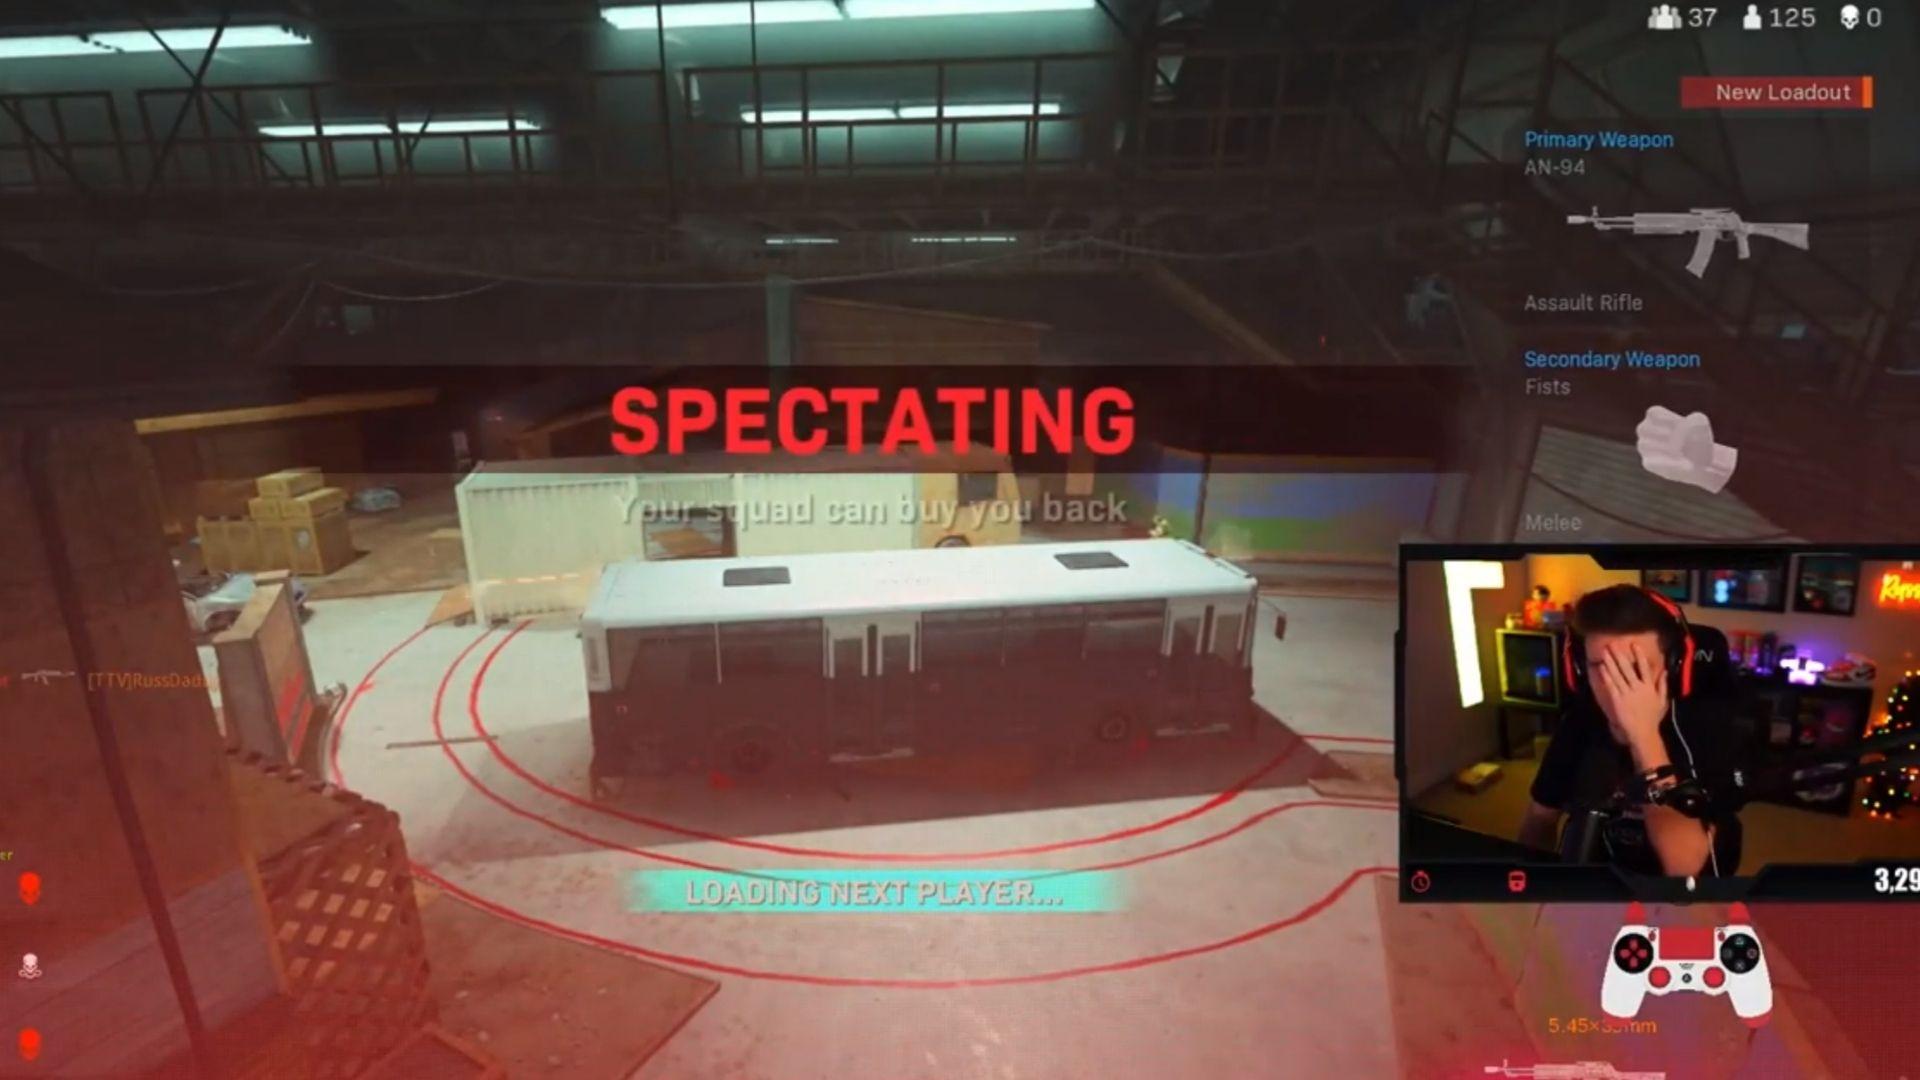 Warzone spectating